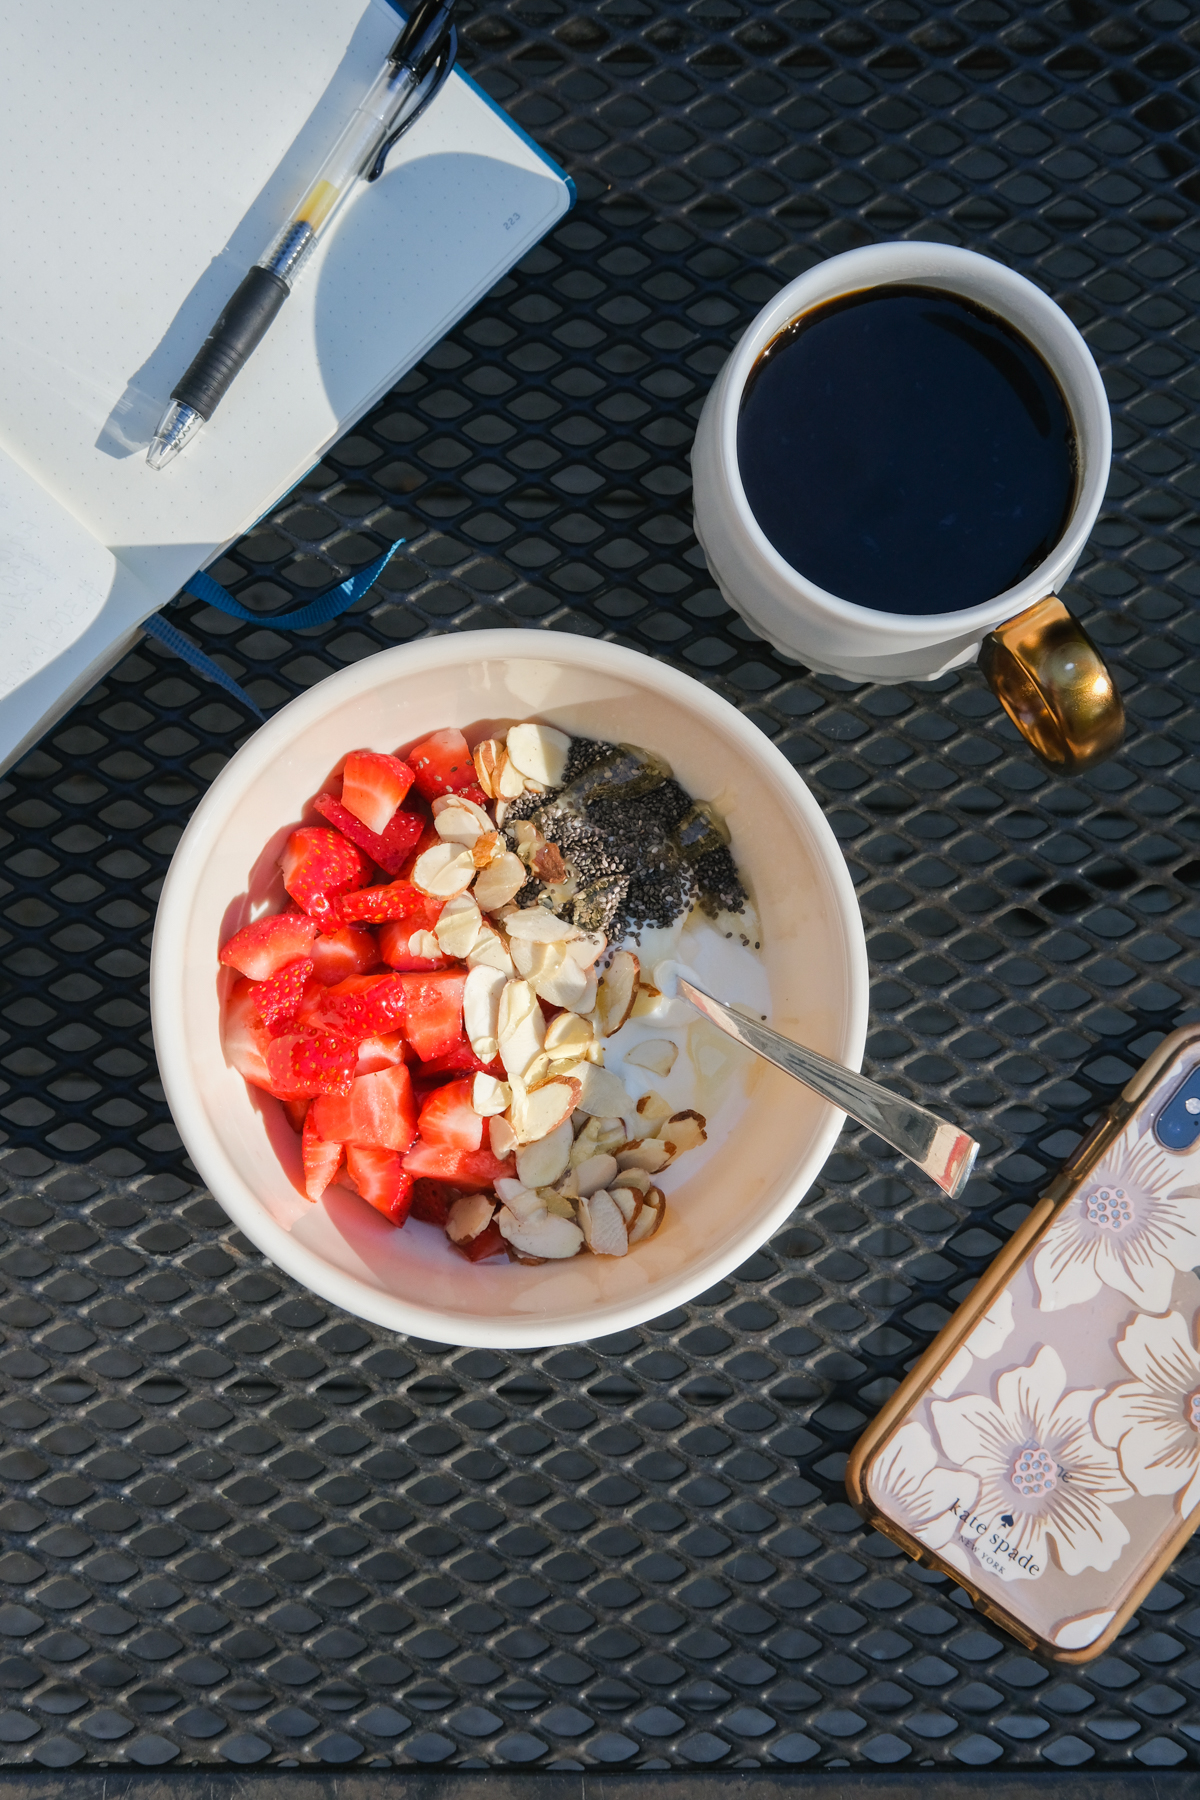 strawberries in a greek yogurt bowl on the deck